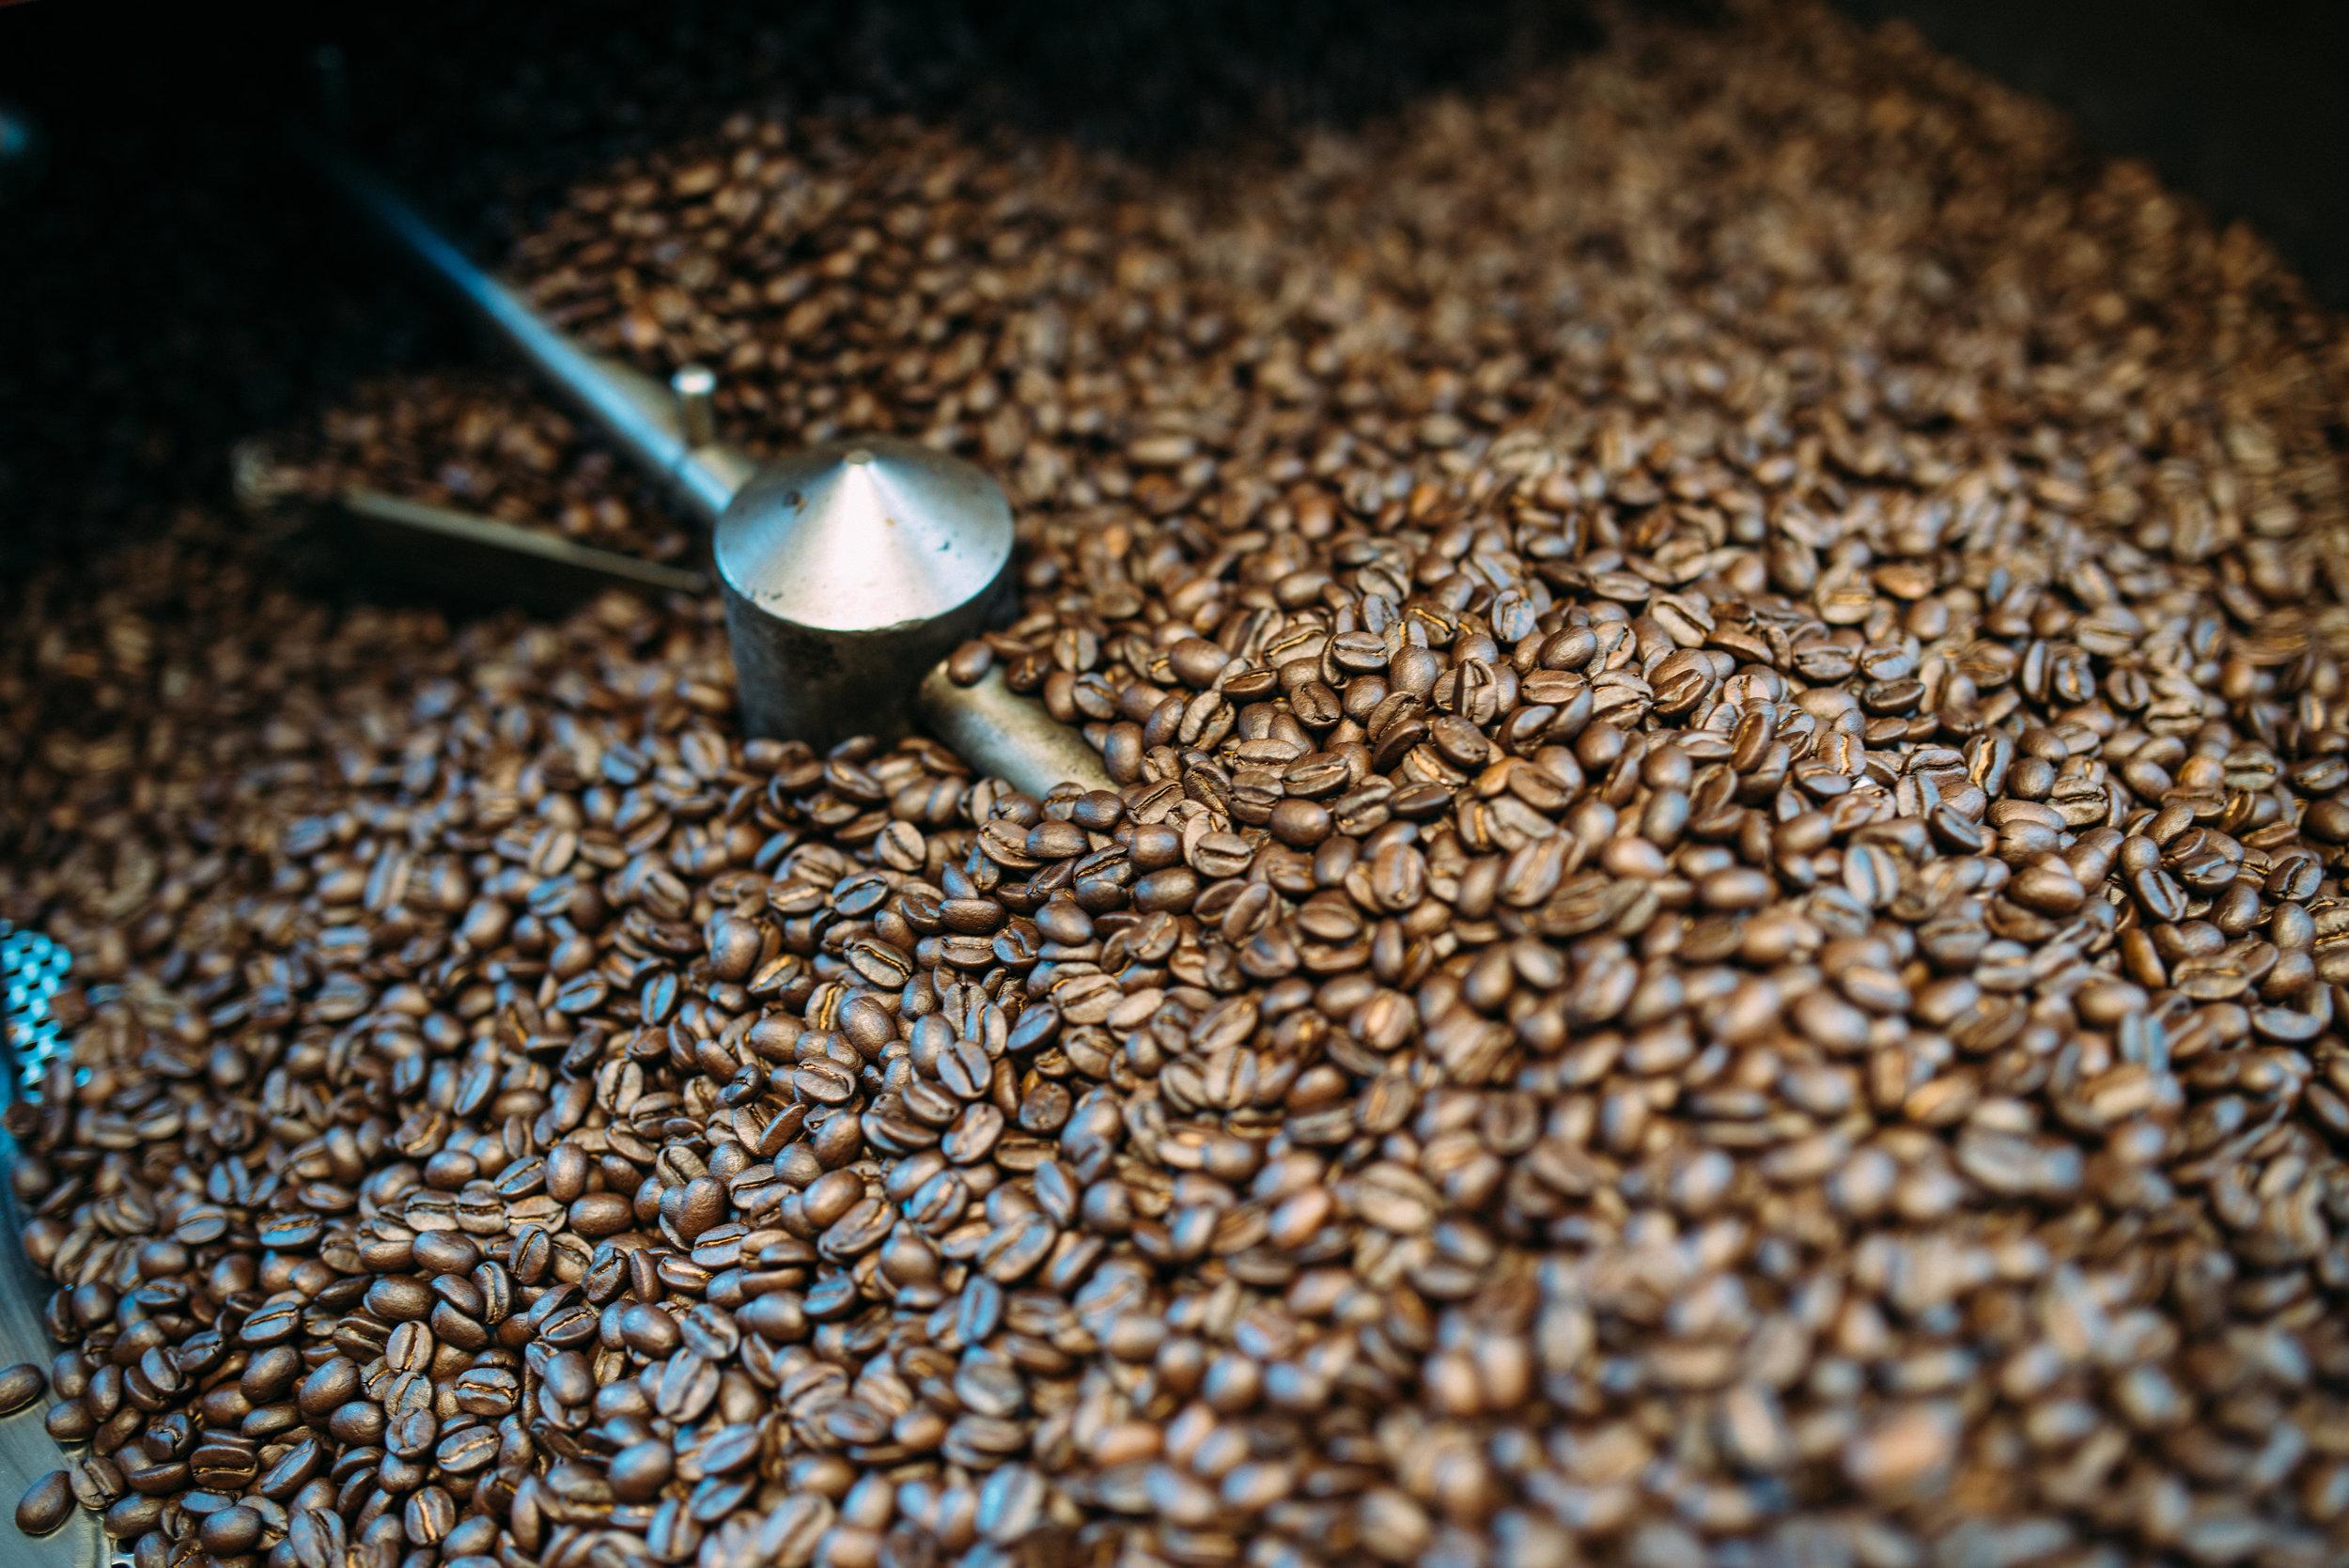 100% Kona Coffee beans being roasted at the Kona Coffee & Tea mill. PHOTO: Blake Wisz